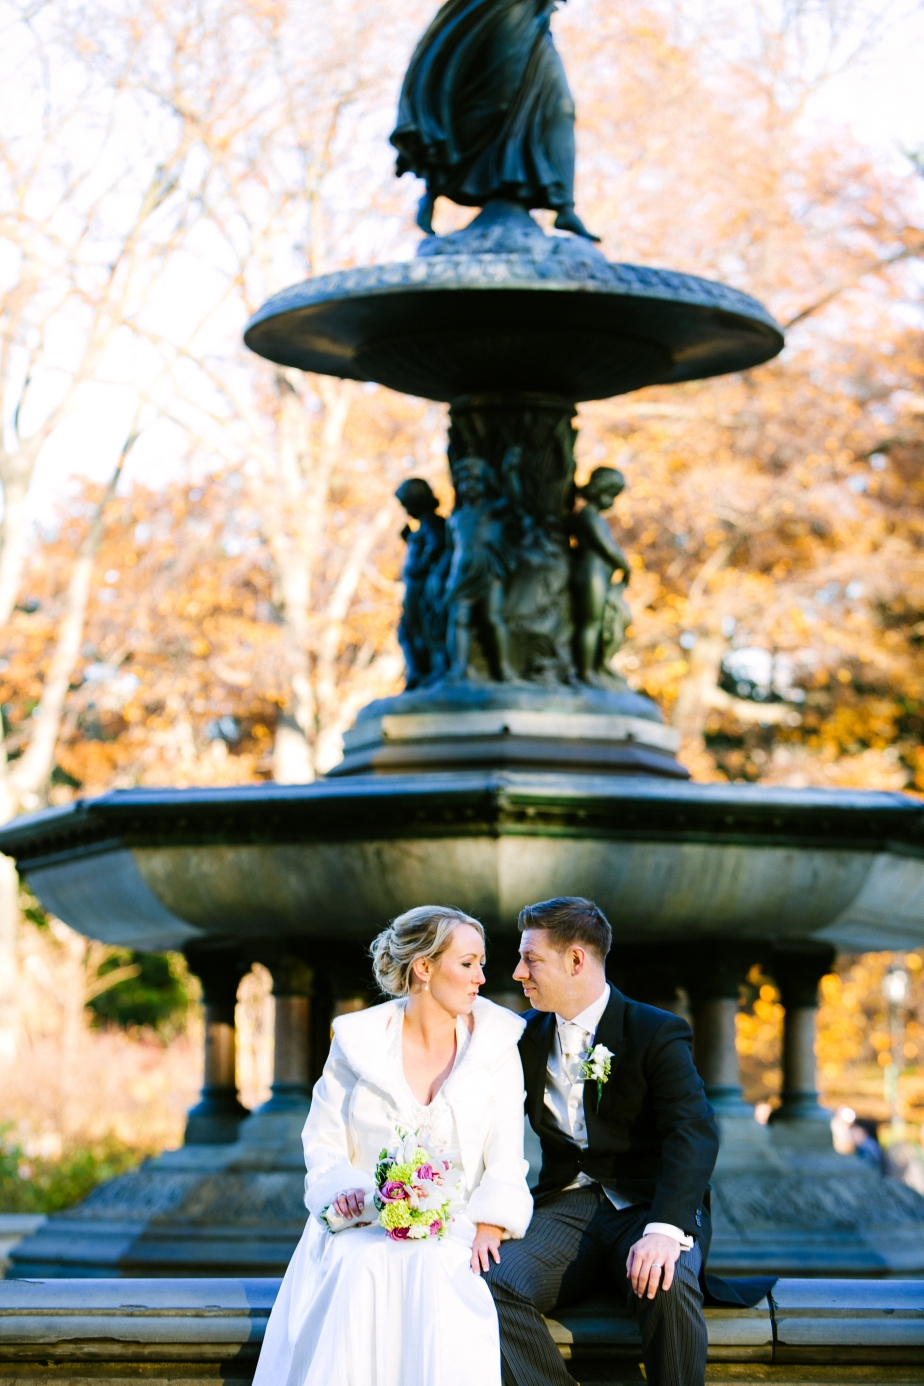 centralpark_ladiespavilion_wedding_EJ-233